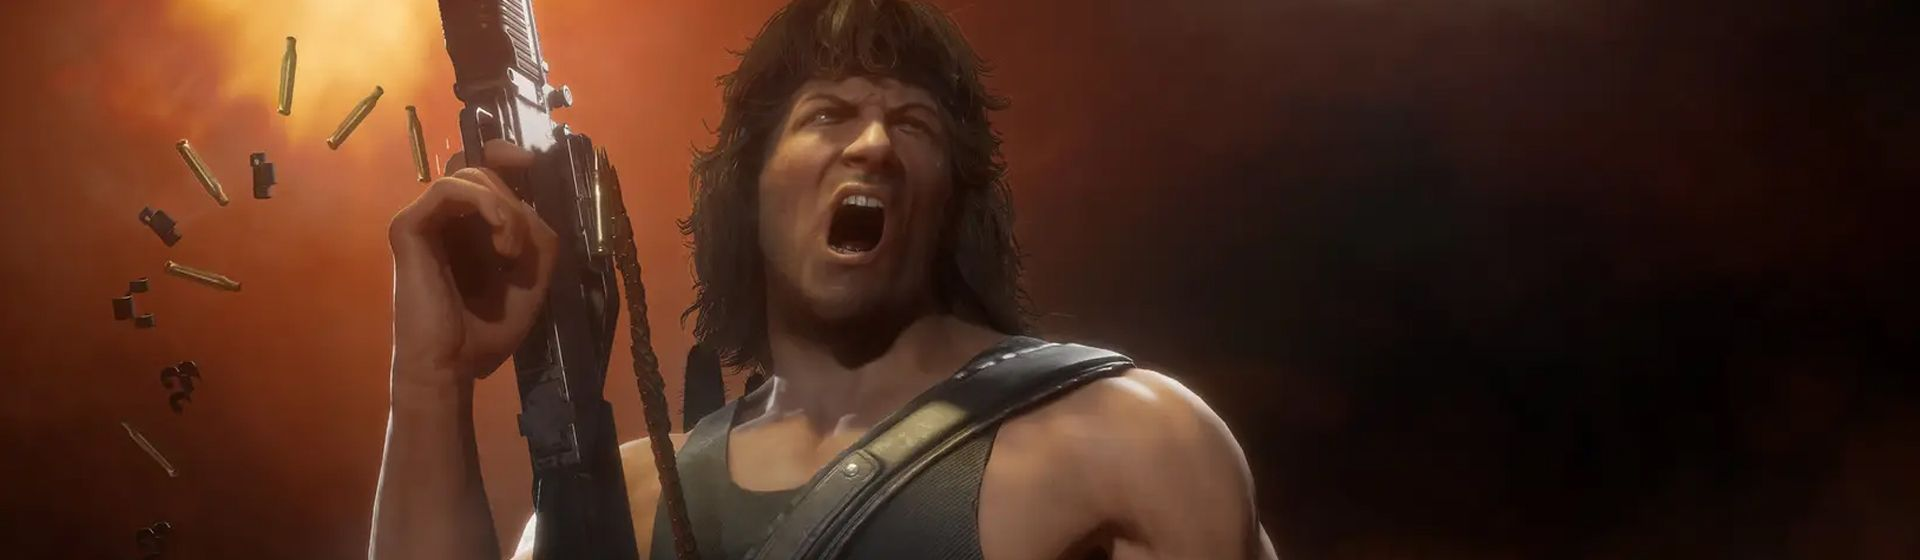 Mortal Kombat 11 adiciona Rambo, Mileena e Rain em nova DLC